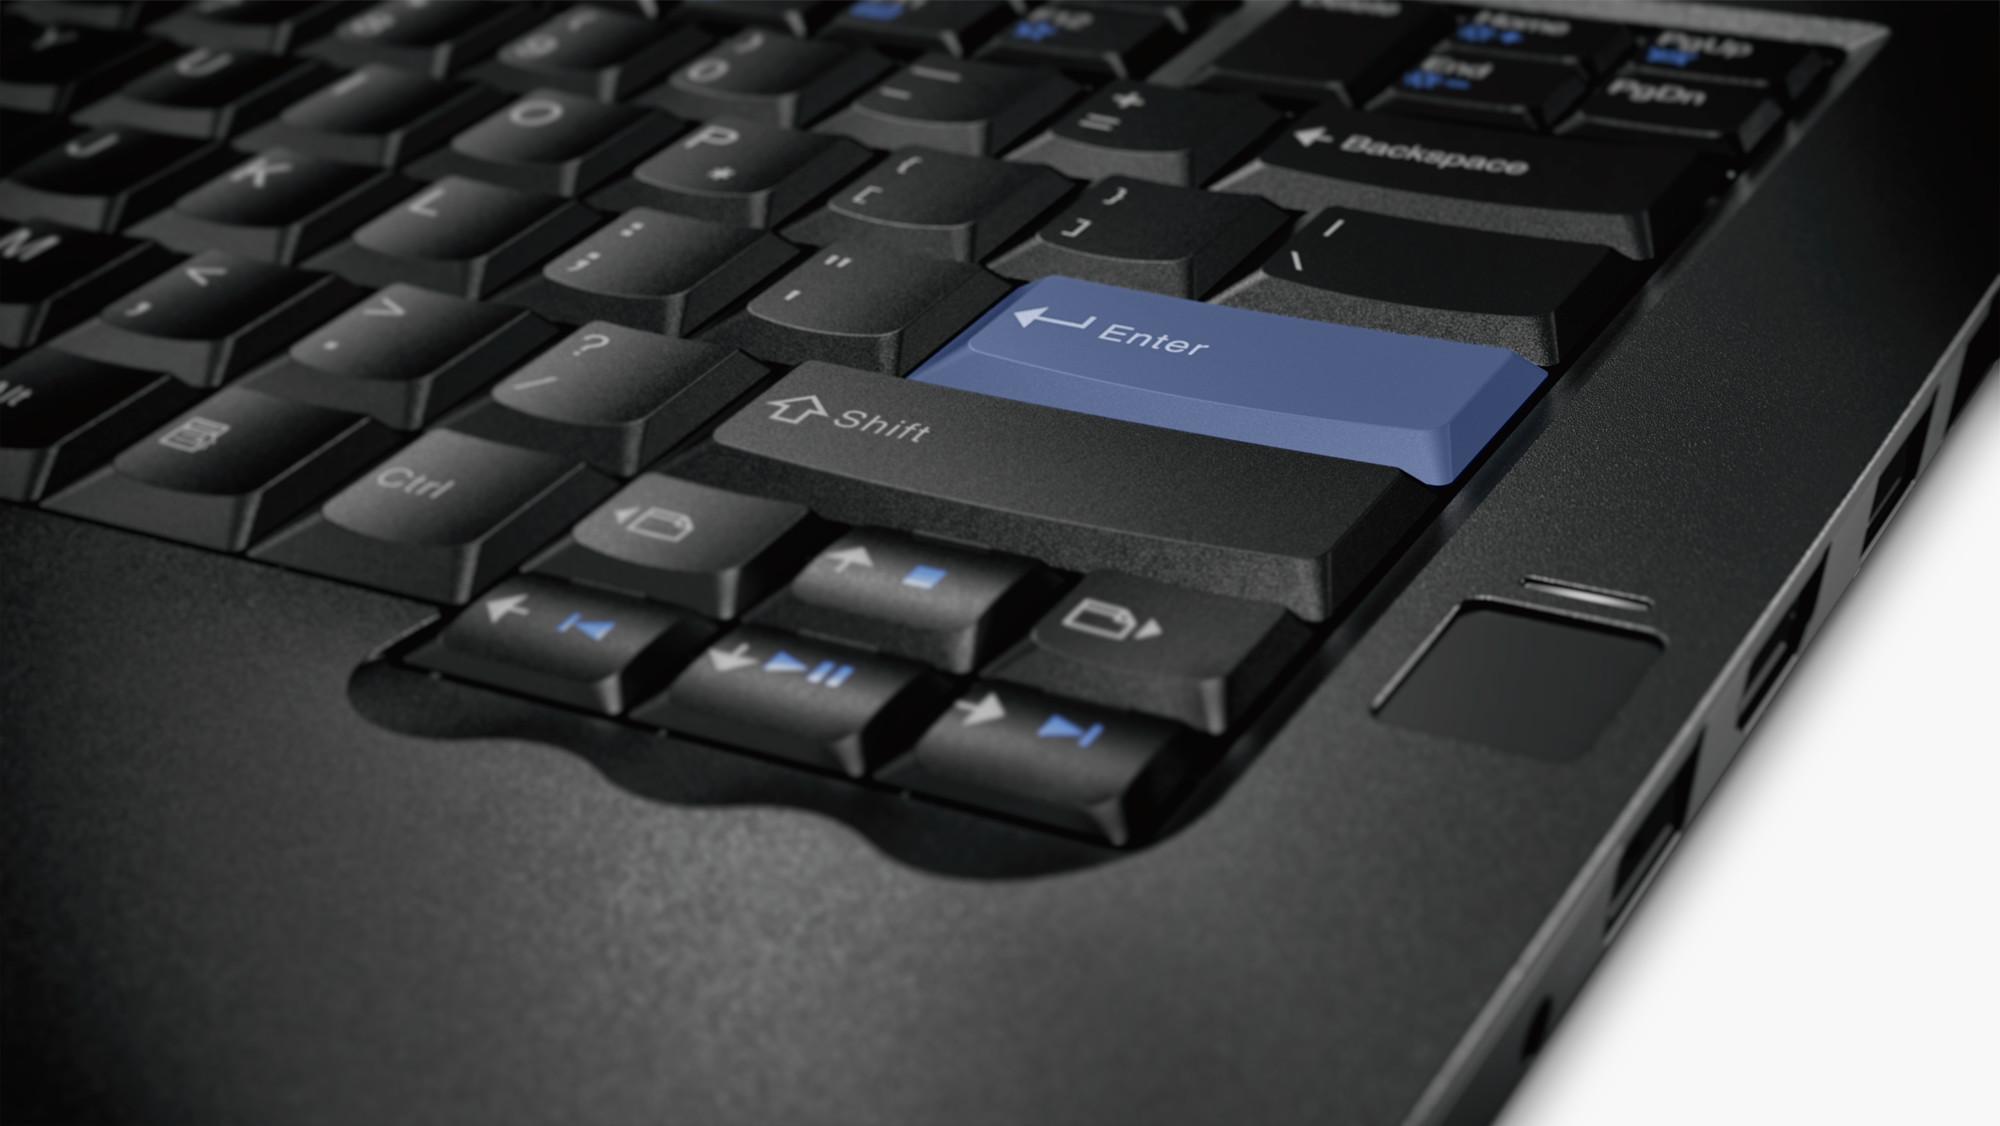 Lenovo ThinkPad 25 review: Sweet nostalgic design with